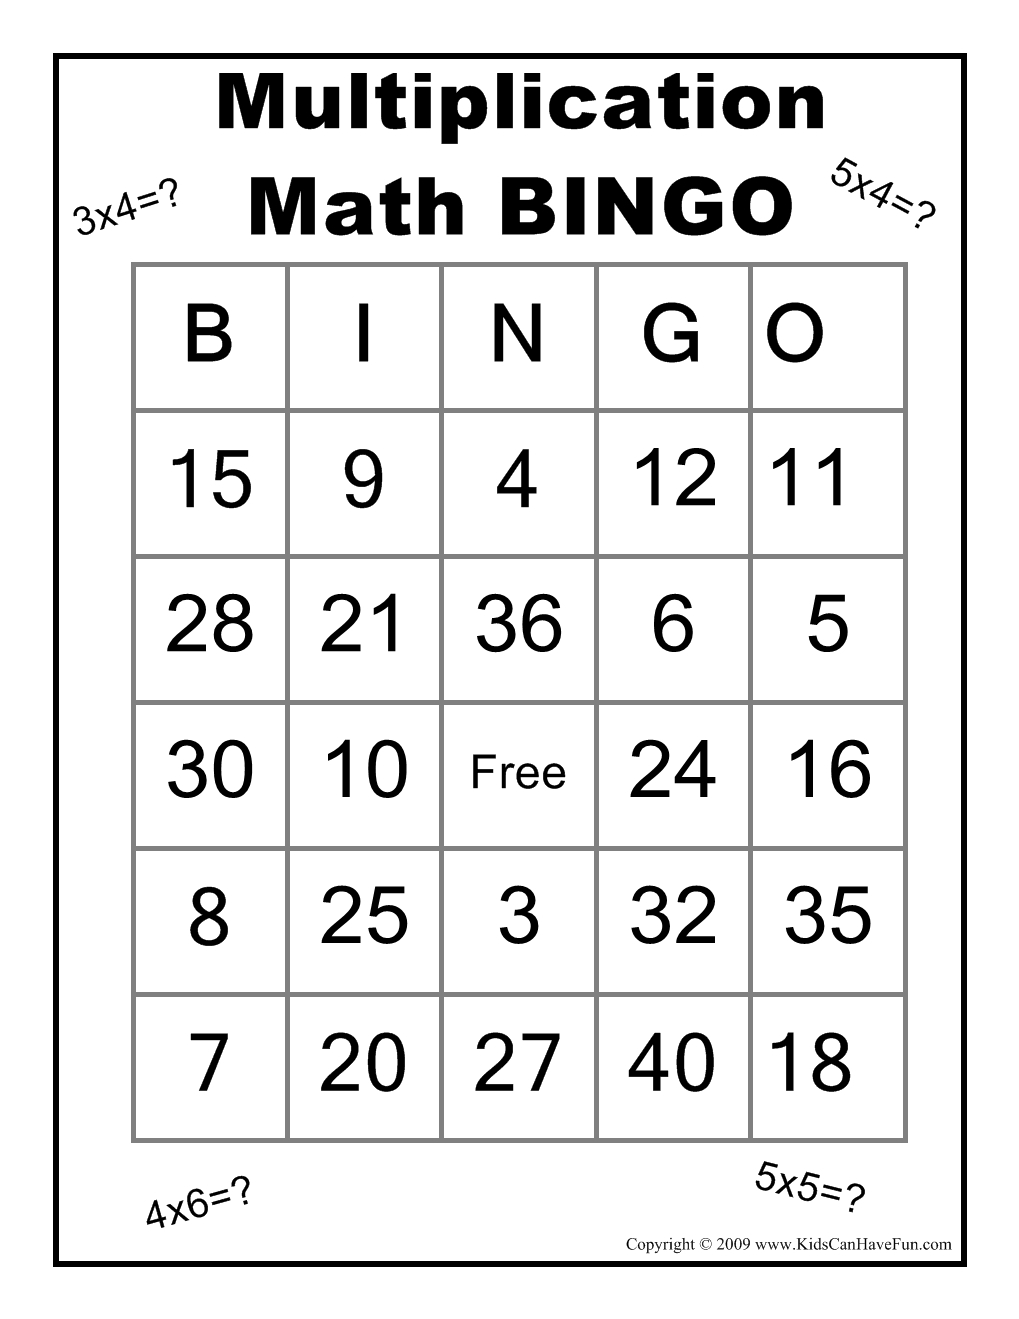 Multiplication Math Bingo Game | Wiskunde